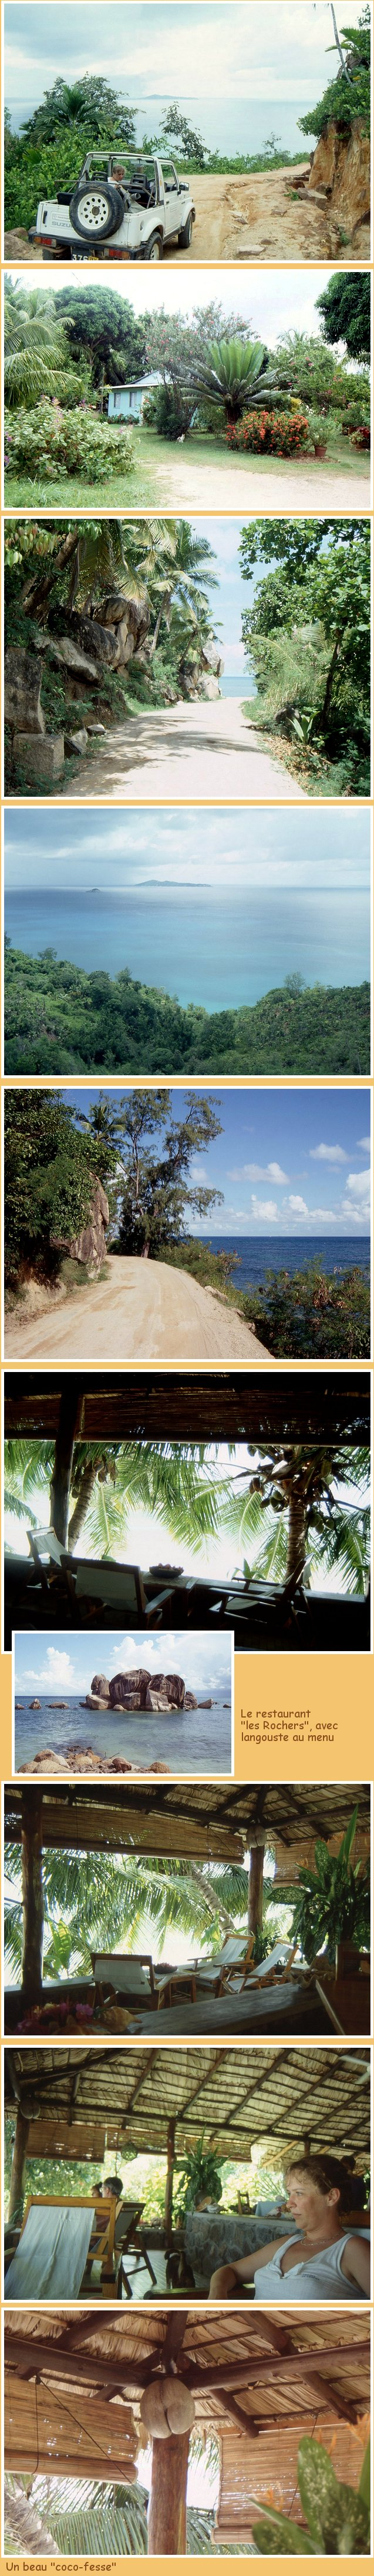 Les Seychelles - 7